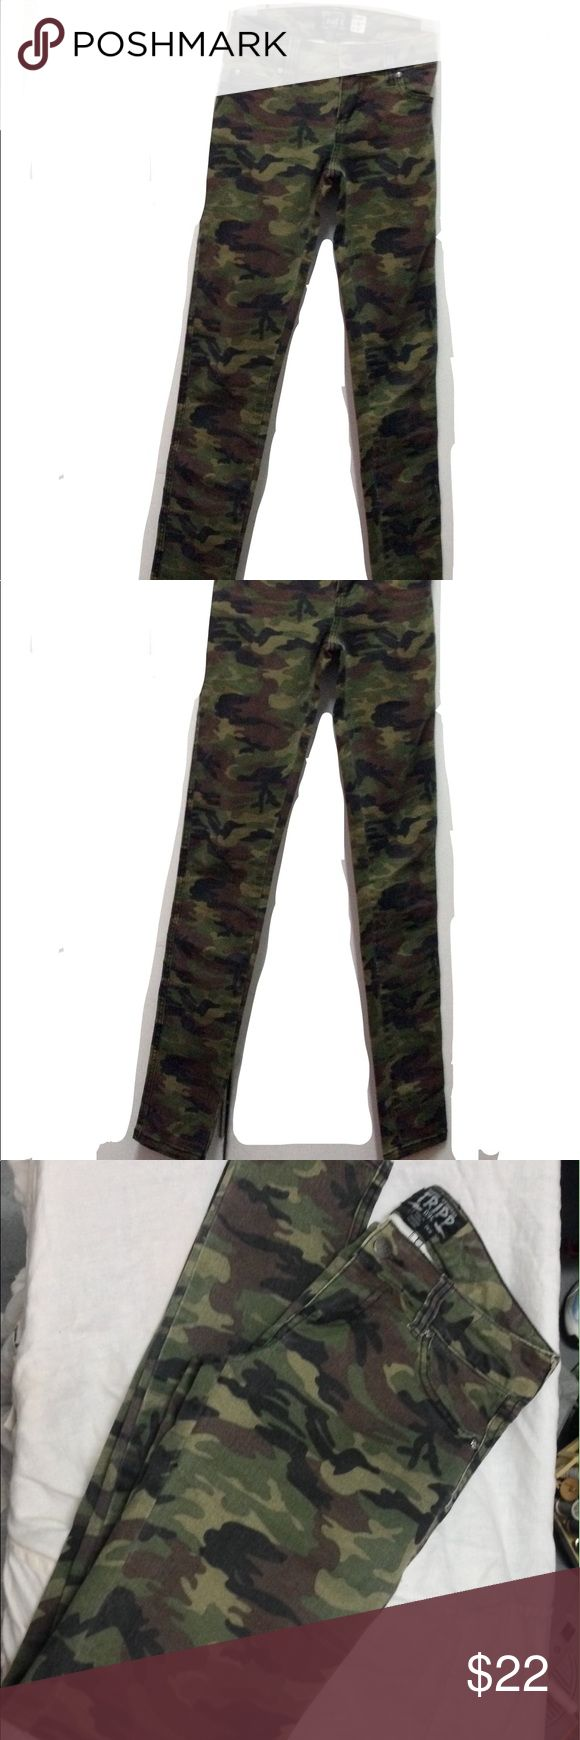 "Tripp NYC Camouflage Skinny Jeans Sz 24 Tripp NYC Army Green Green Camouflage Print Stretch Skinny Jeans Sz 24"" W x 32""L LIKE NEW NEVER WORN, PRISTINE CONDITION NO FADING OR STRETCHING RUNS BIG SUPER STRETCHY DENIM Tripp nyc Jeans Skinny"